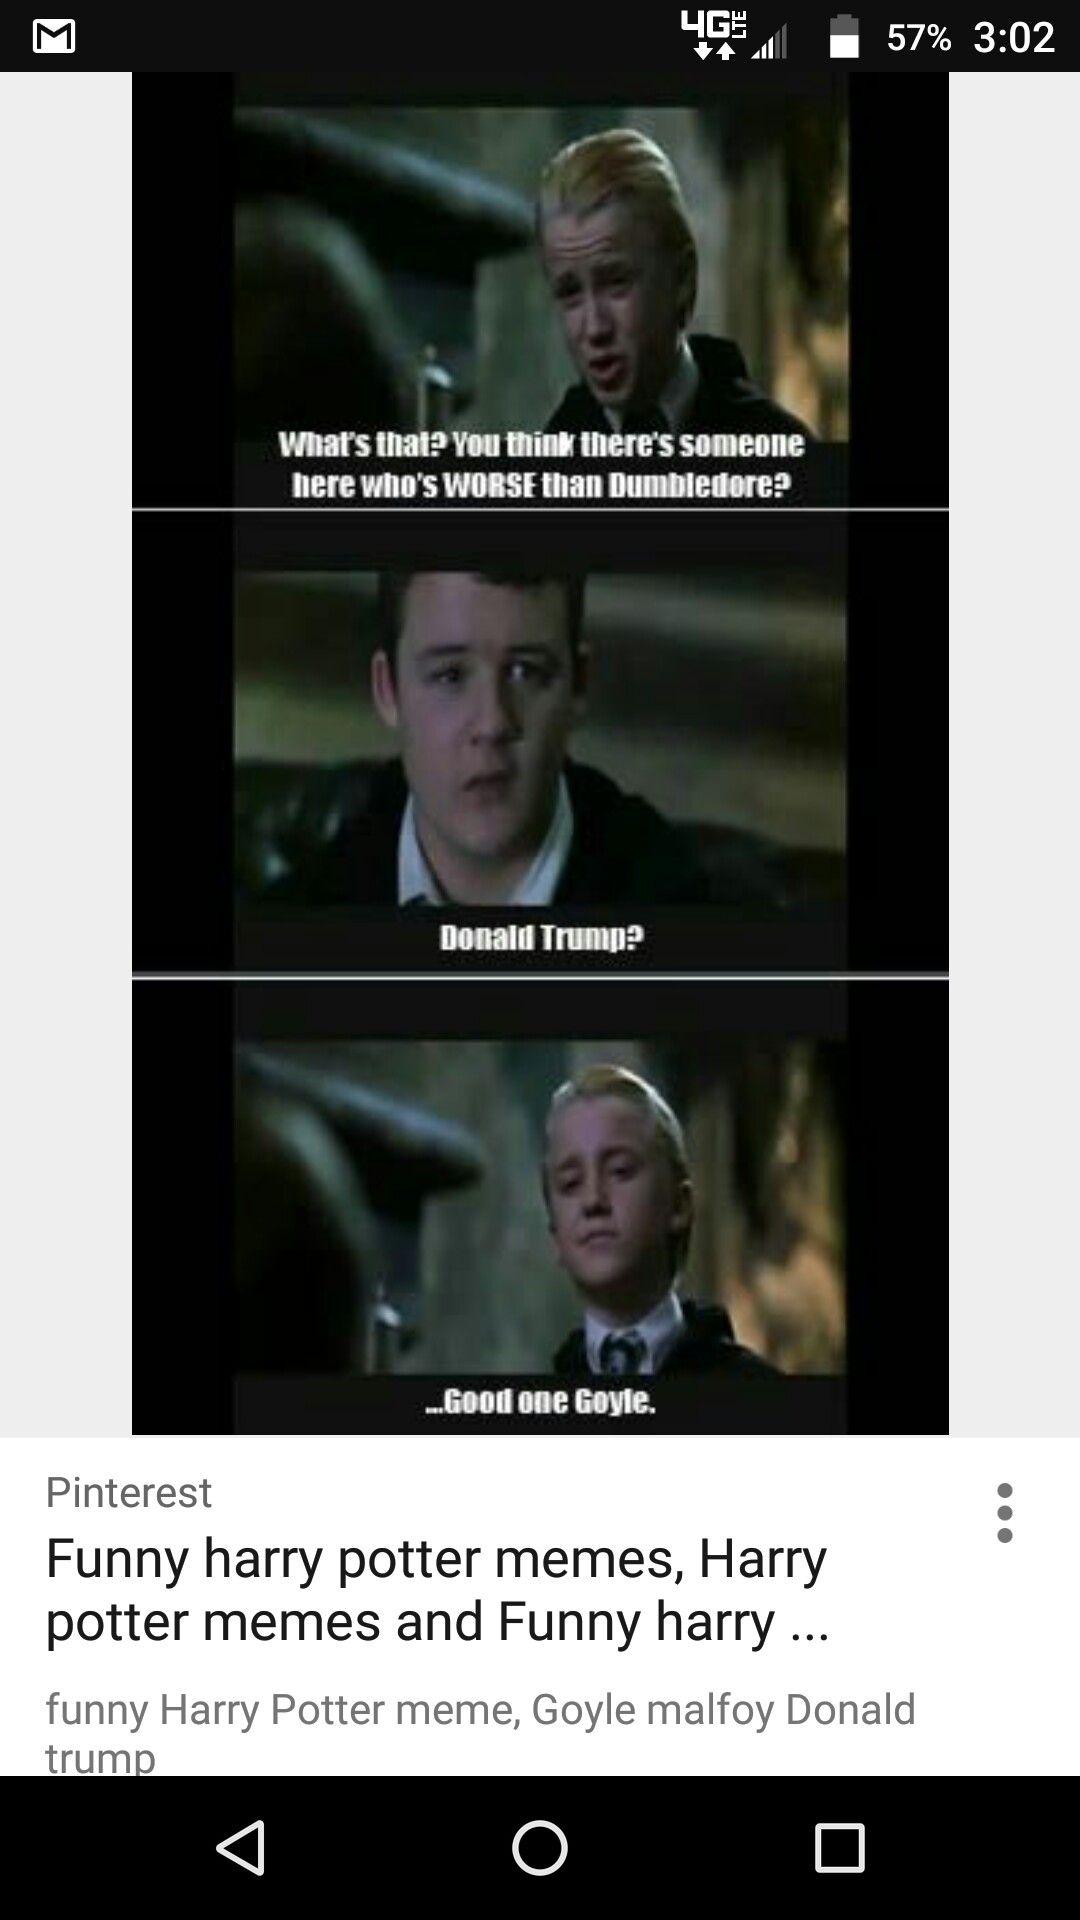 Funny Harry Potter Meme, Goyle Malfoy Donald Trump (Just A